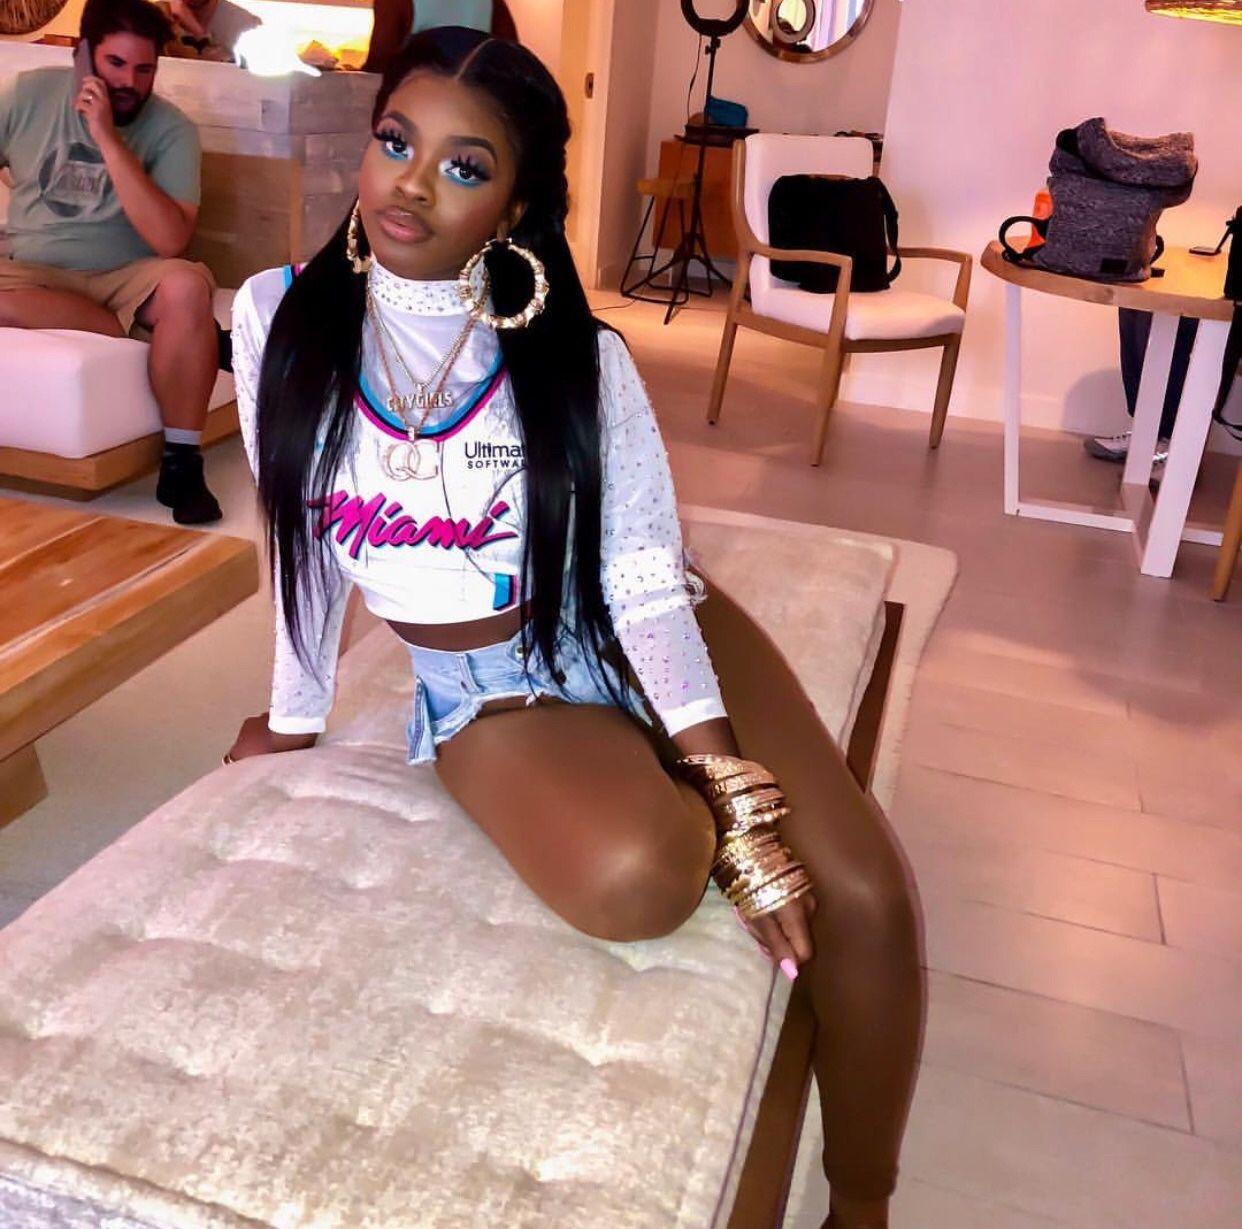 Ebony grote buit Girls pics